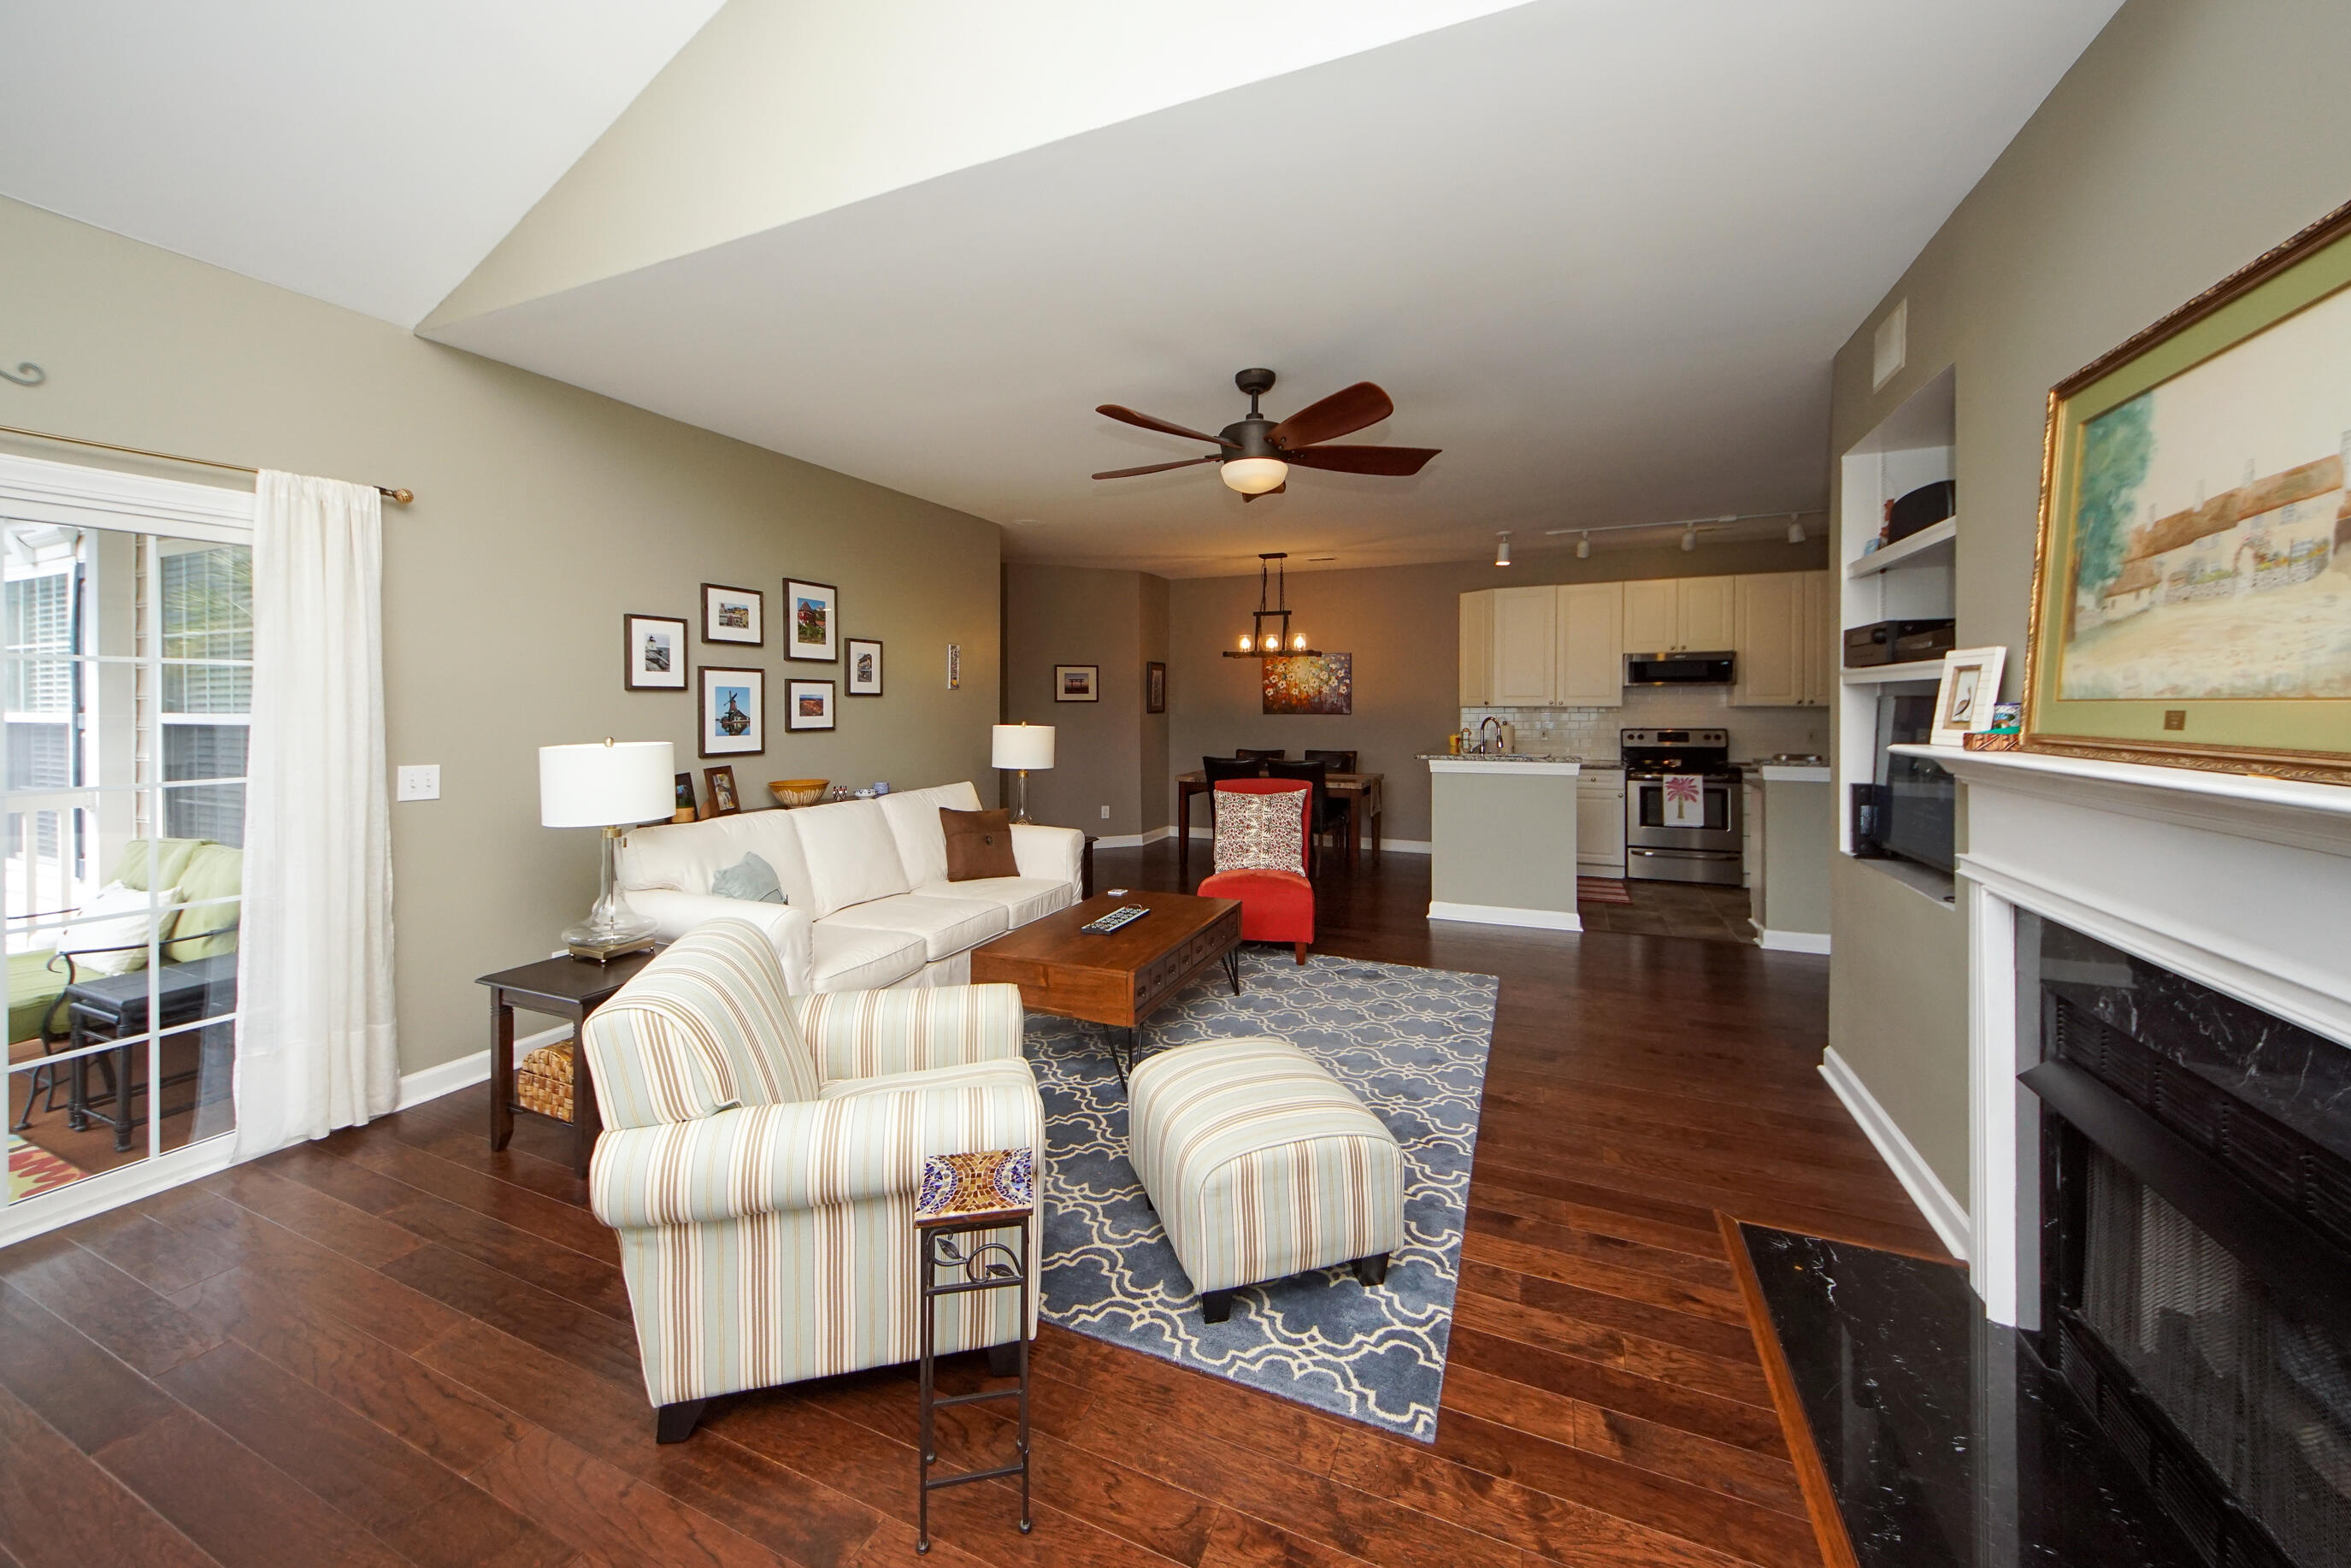 Dunes West Homes For Sale - 1631 Camfield, Mount Pleasant, SC - 8